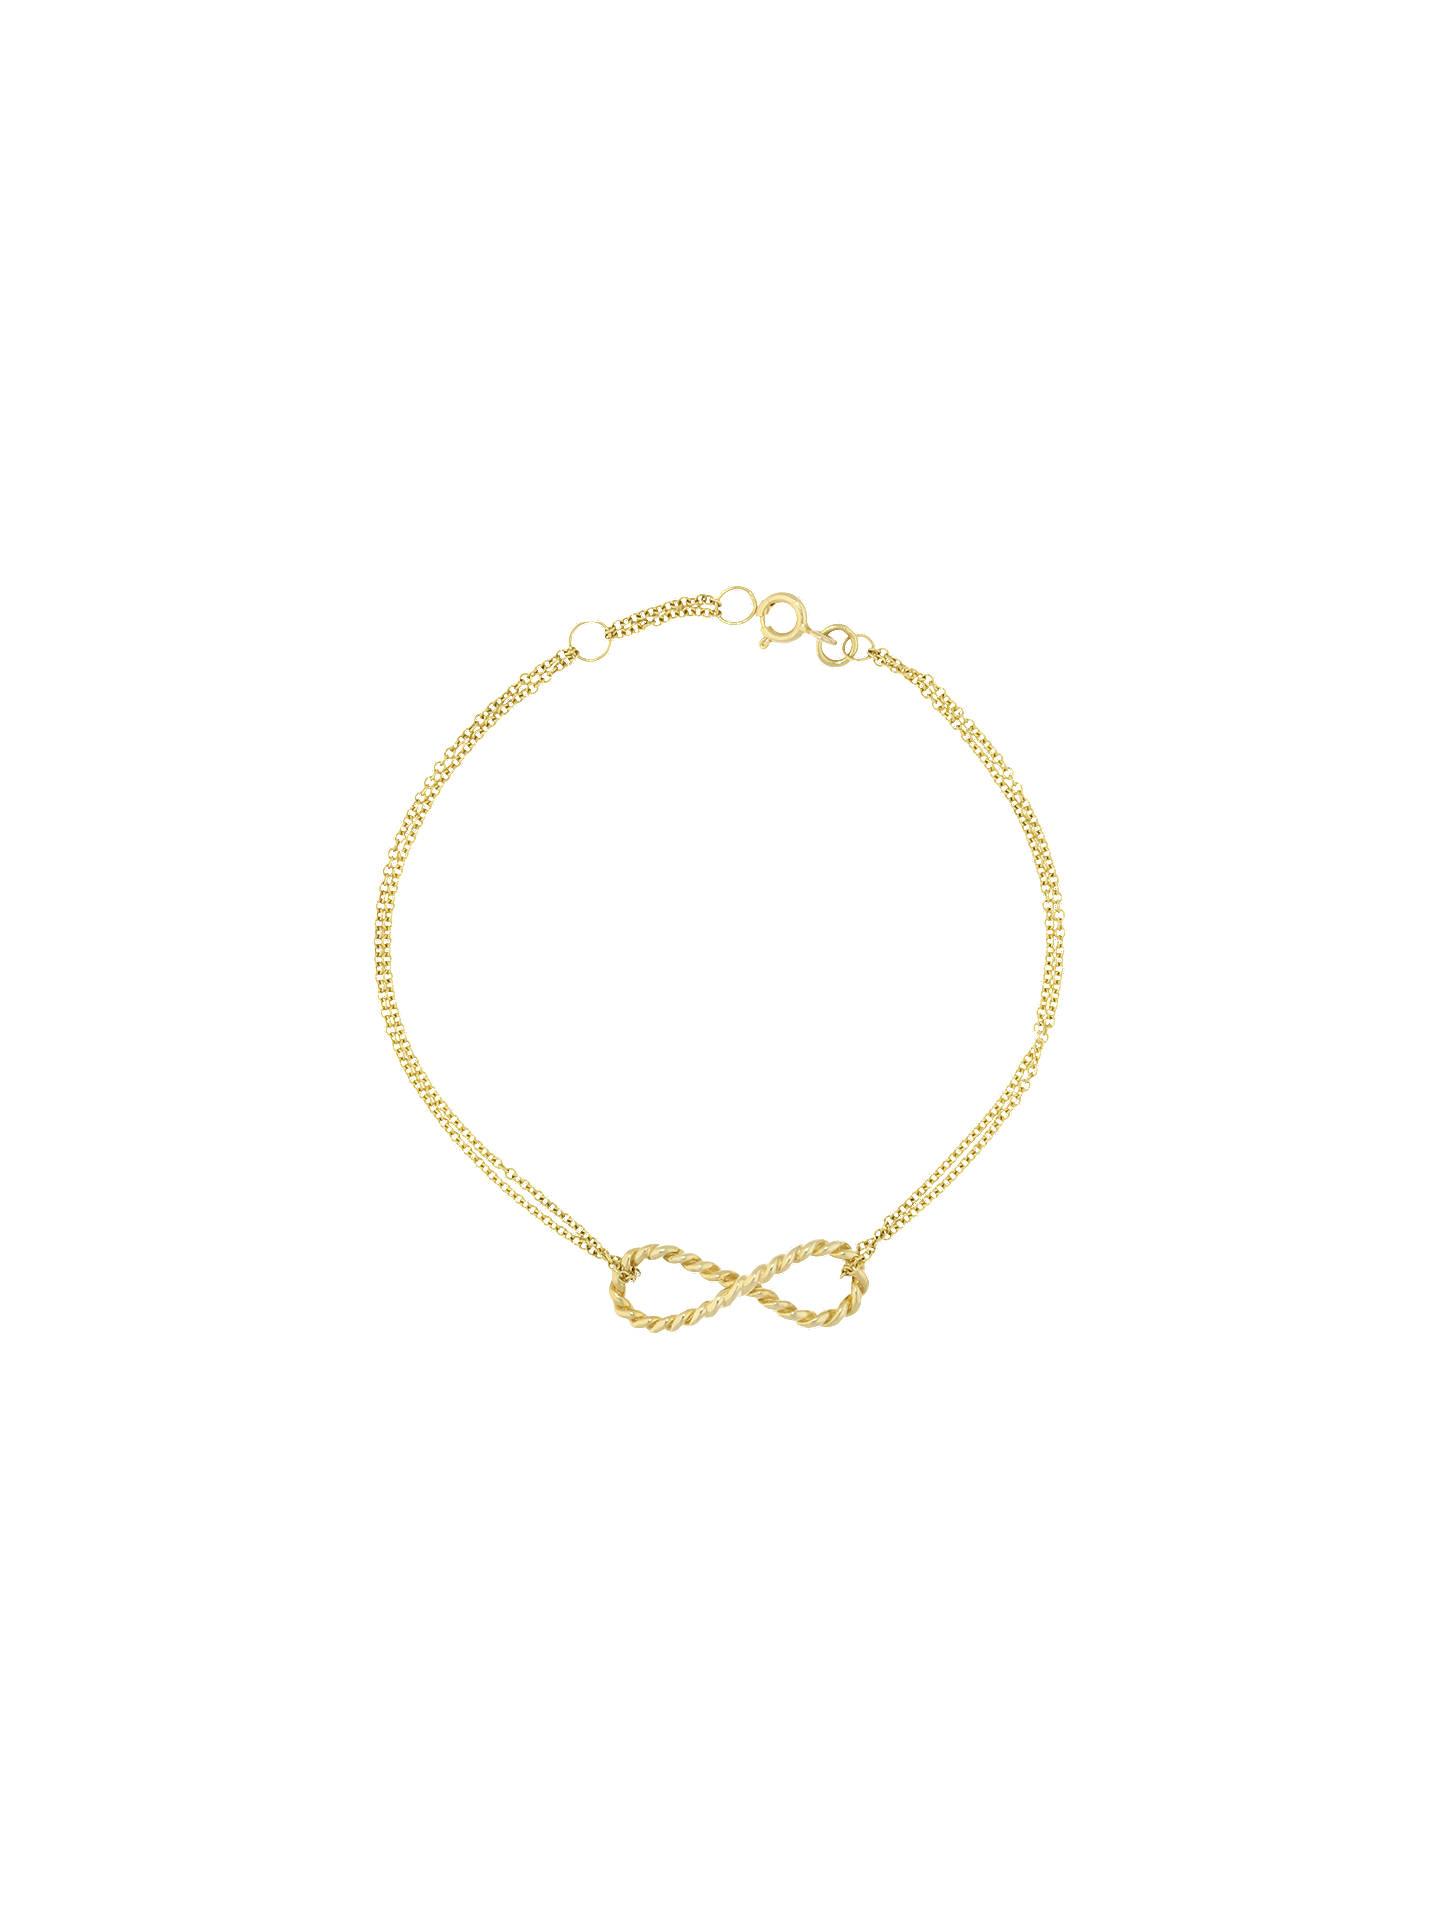 BuyLondon Road 9ct Gold Infinity Bracelet 7fe1db986